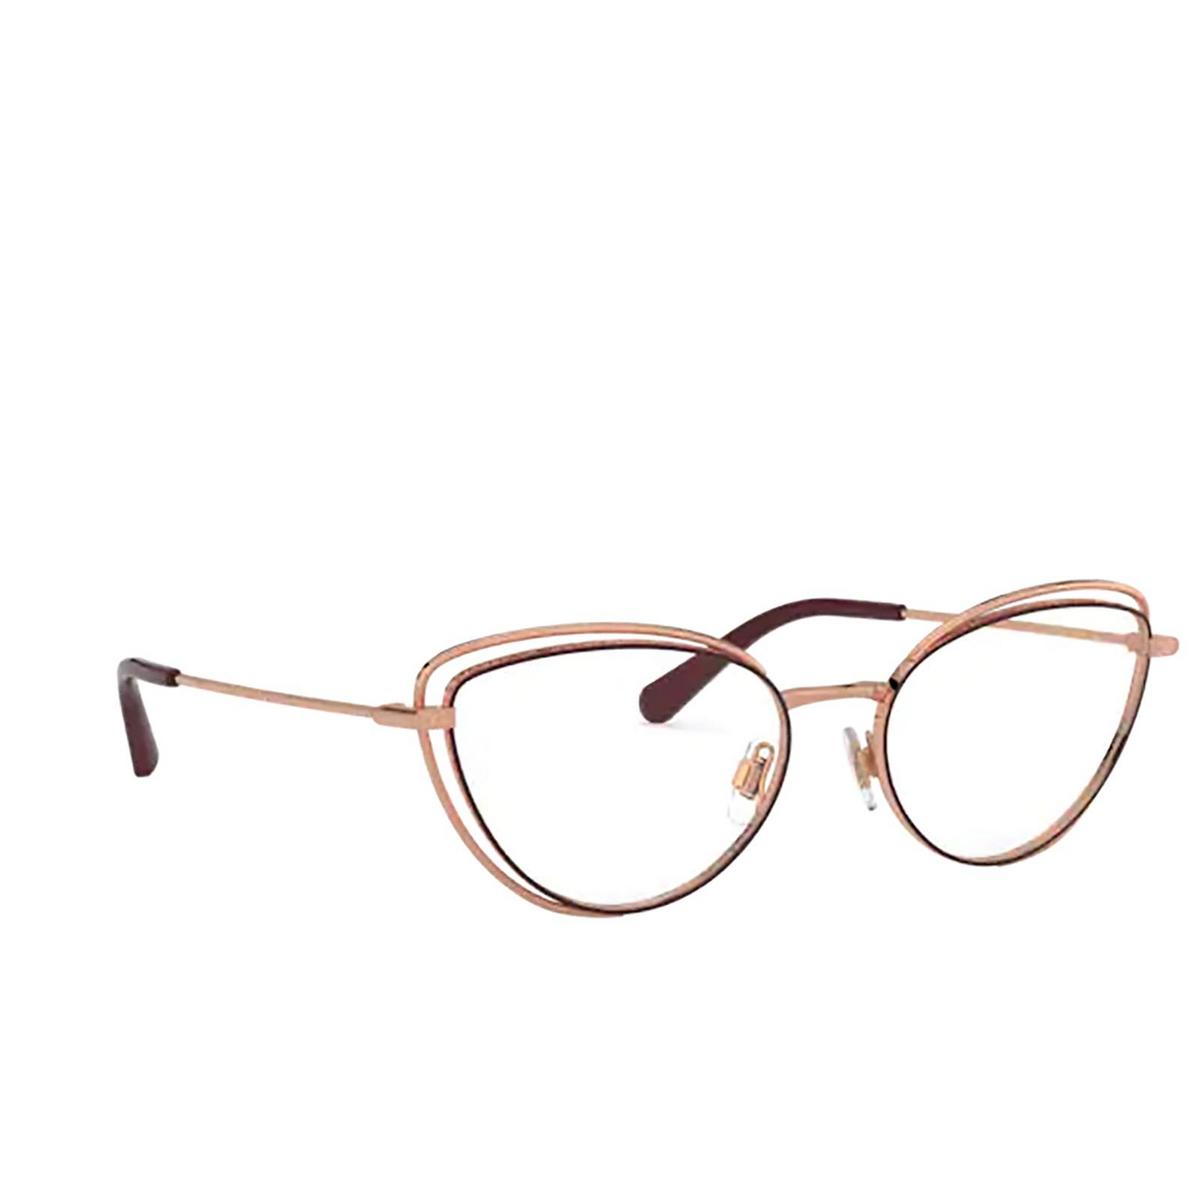 Dolce & Gabbana® Cat-eye Eyeglasses: DG1326 color Pink Gold / Bordeaux 1333 - three-quarters view.